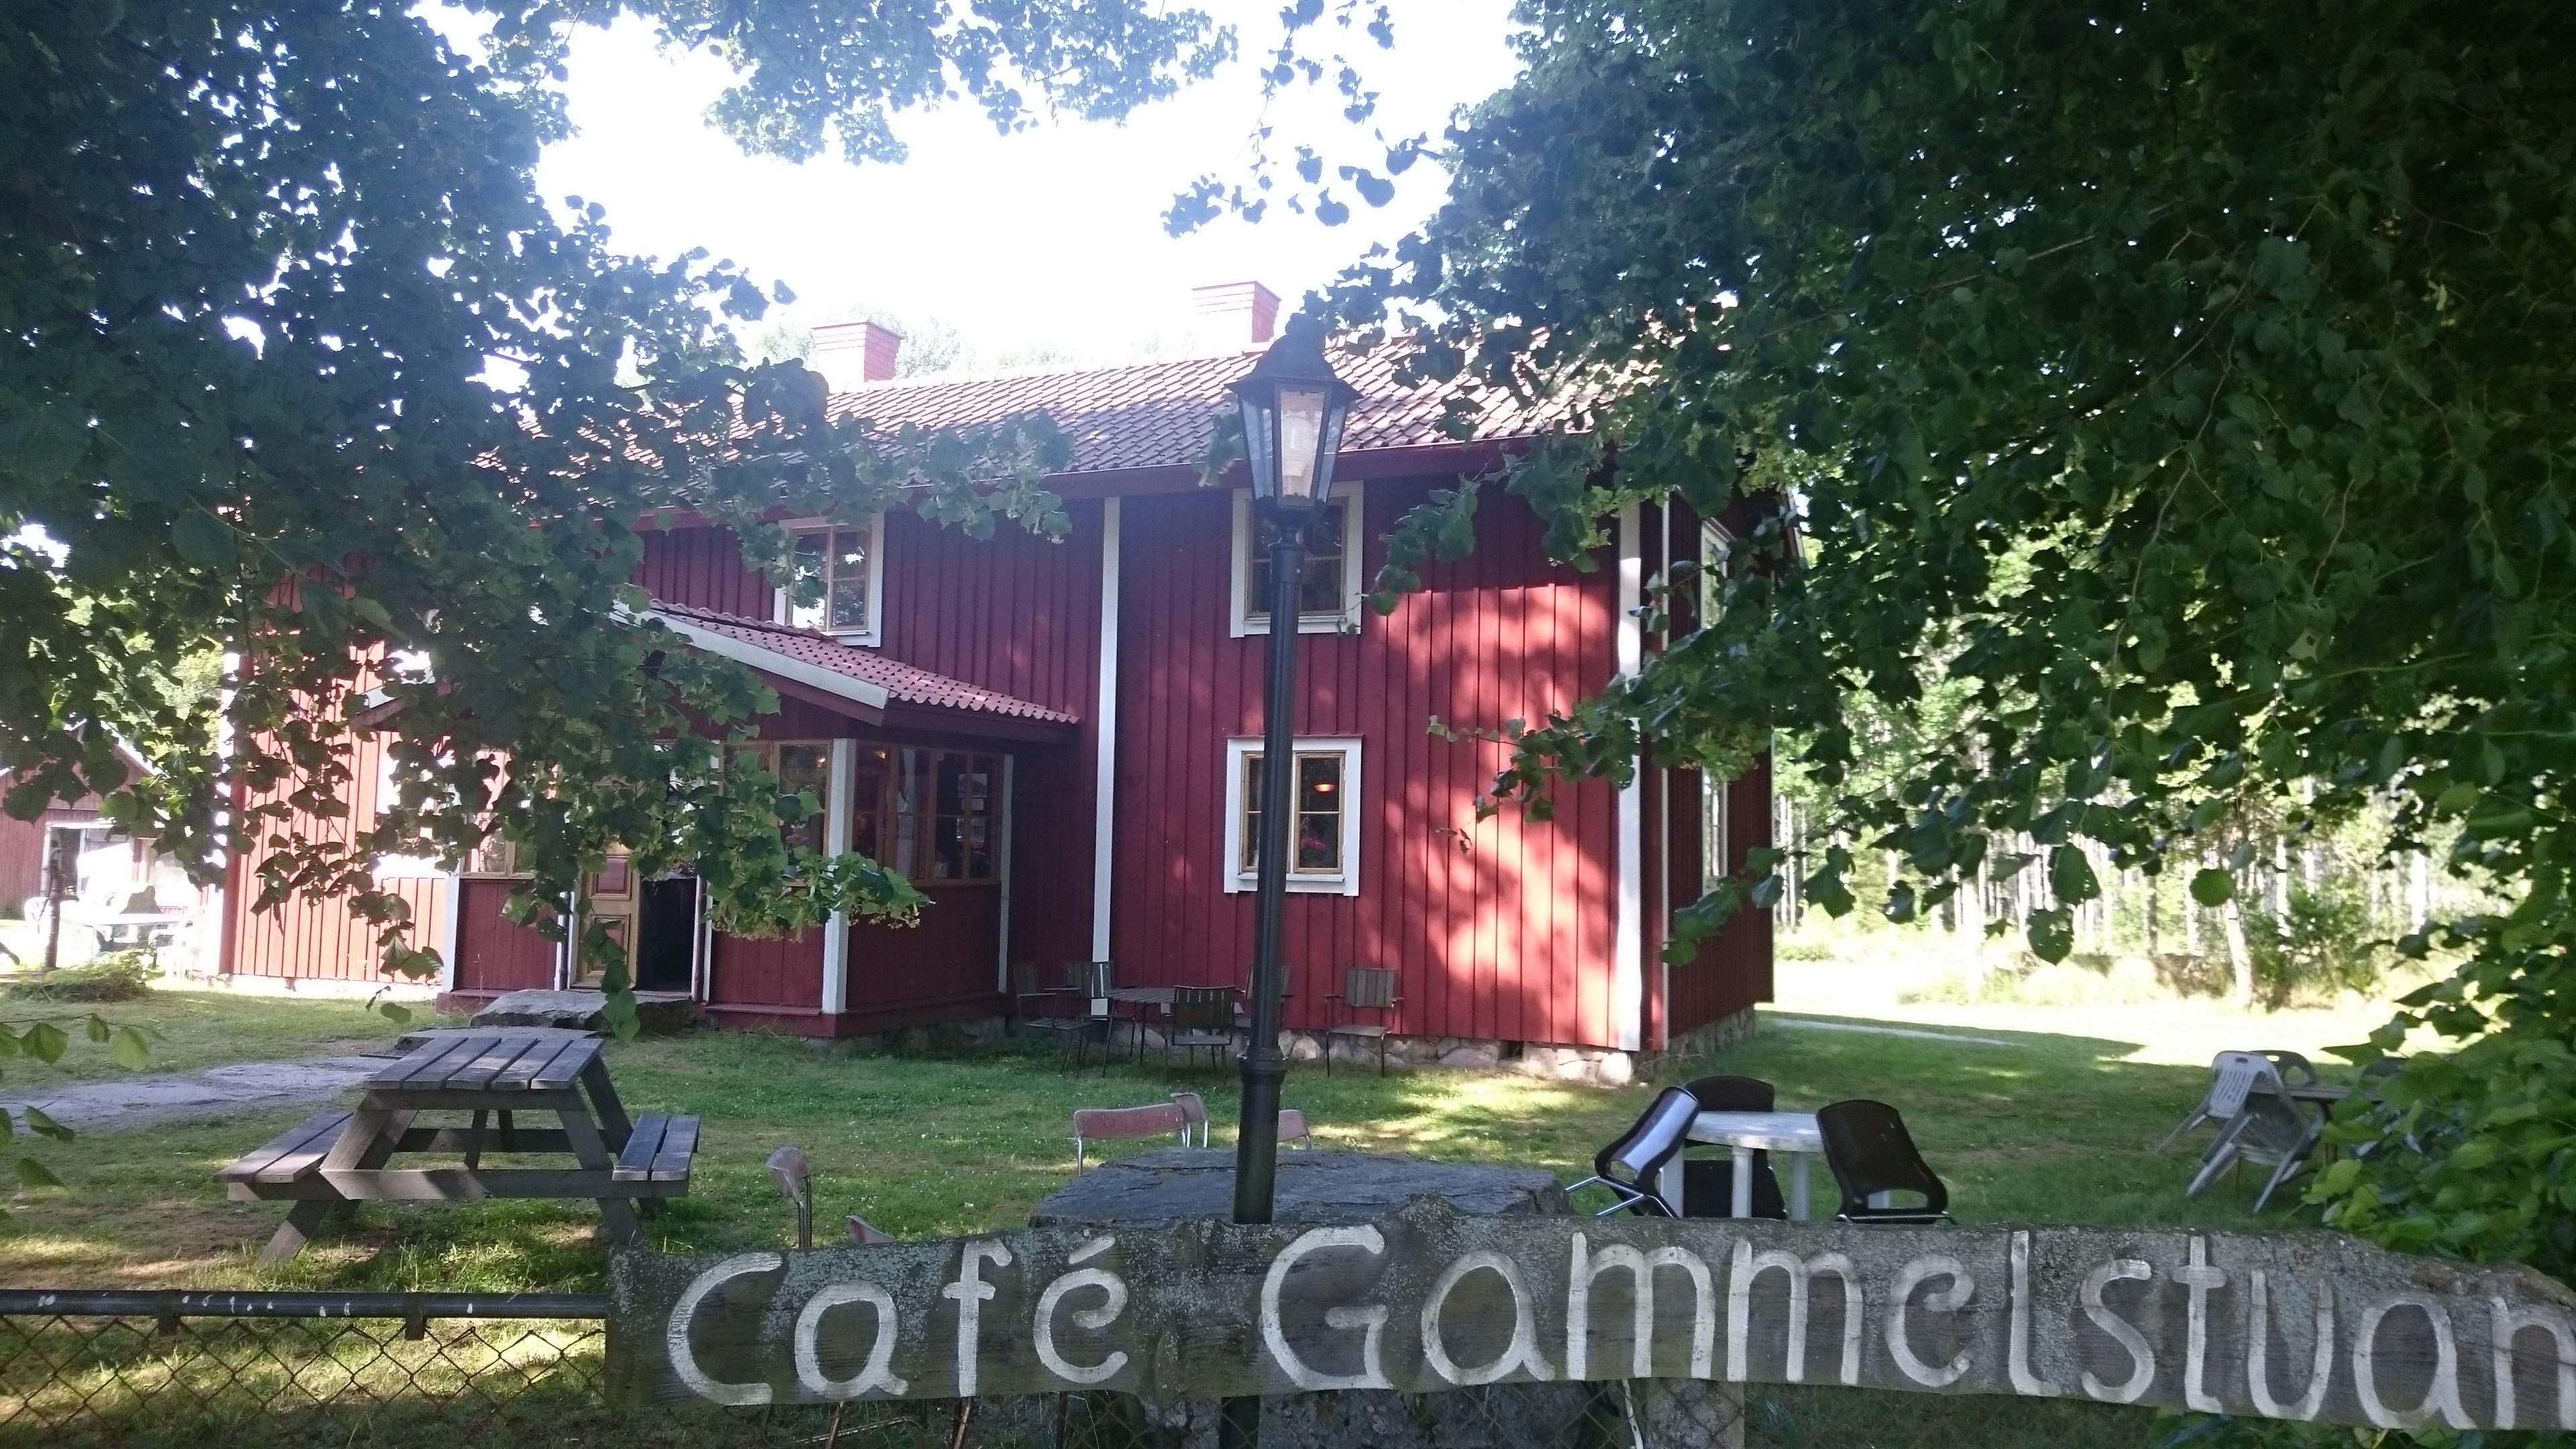 Sofia Carlsson,  © Tingsryds kommun, Café Gammelstua i Bredaslätt